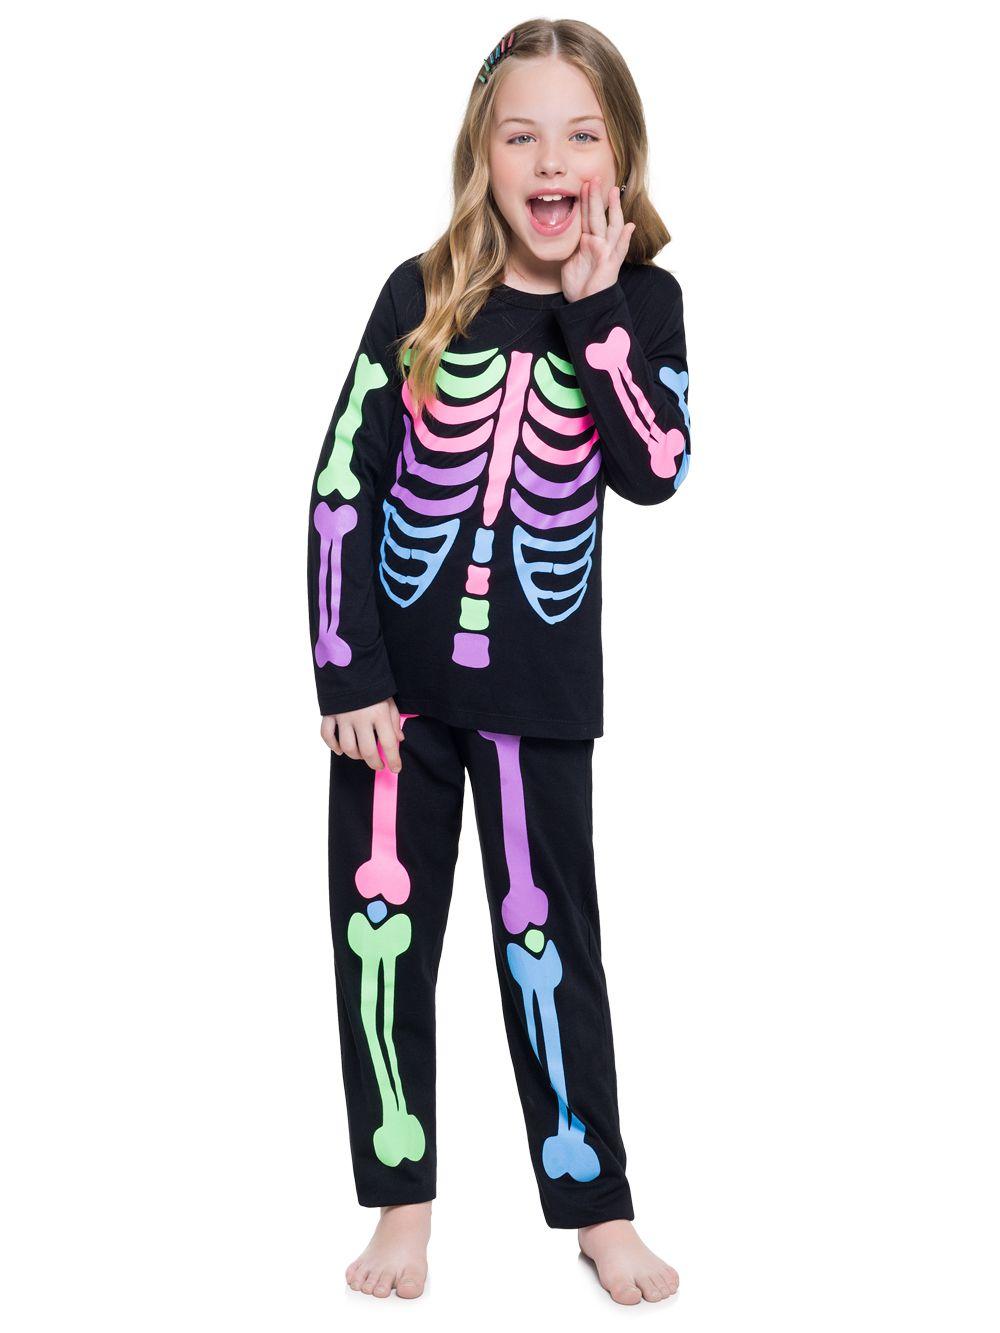 Pijama esqueleto infantil menina acompanha saia organza cristal